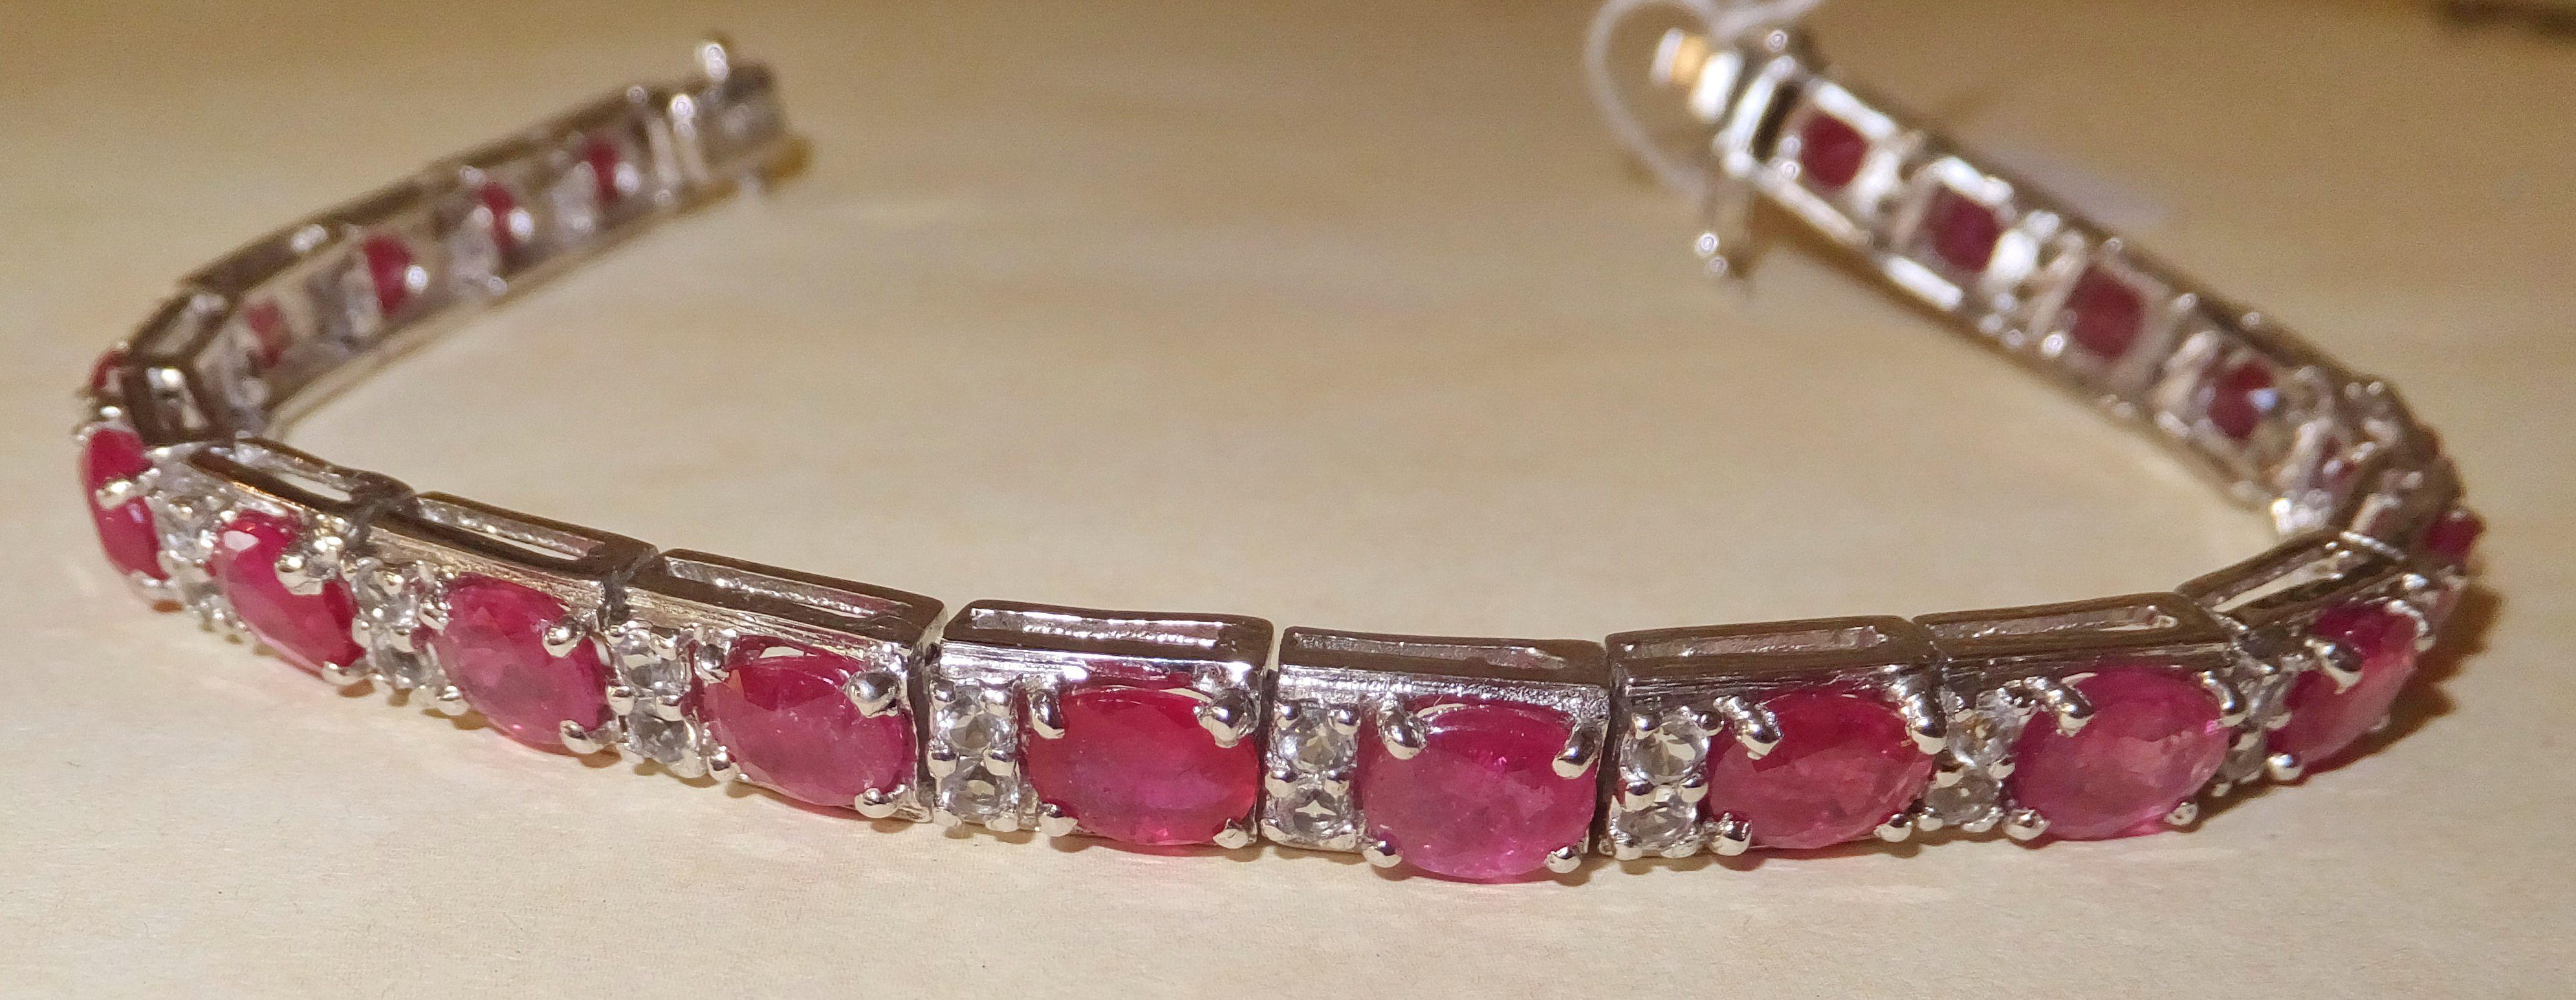 12 Carat Ruby White Sapphire Bracelet Sapphire Bracelet Italian Charm Bracelet Charm Bracelet